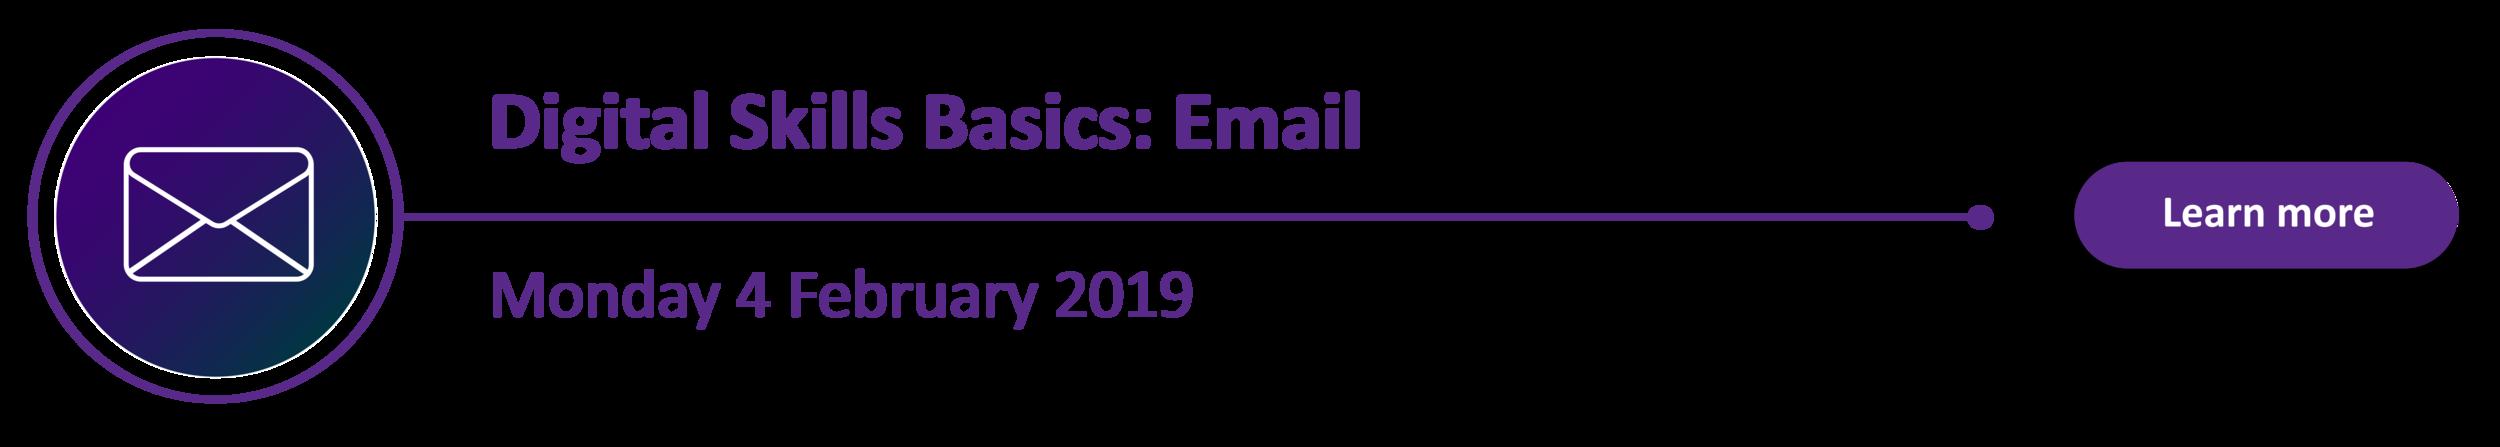 Digital skills basics- email.png